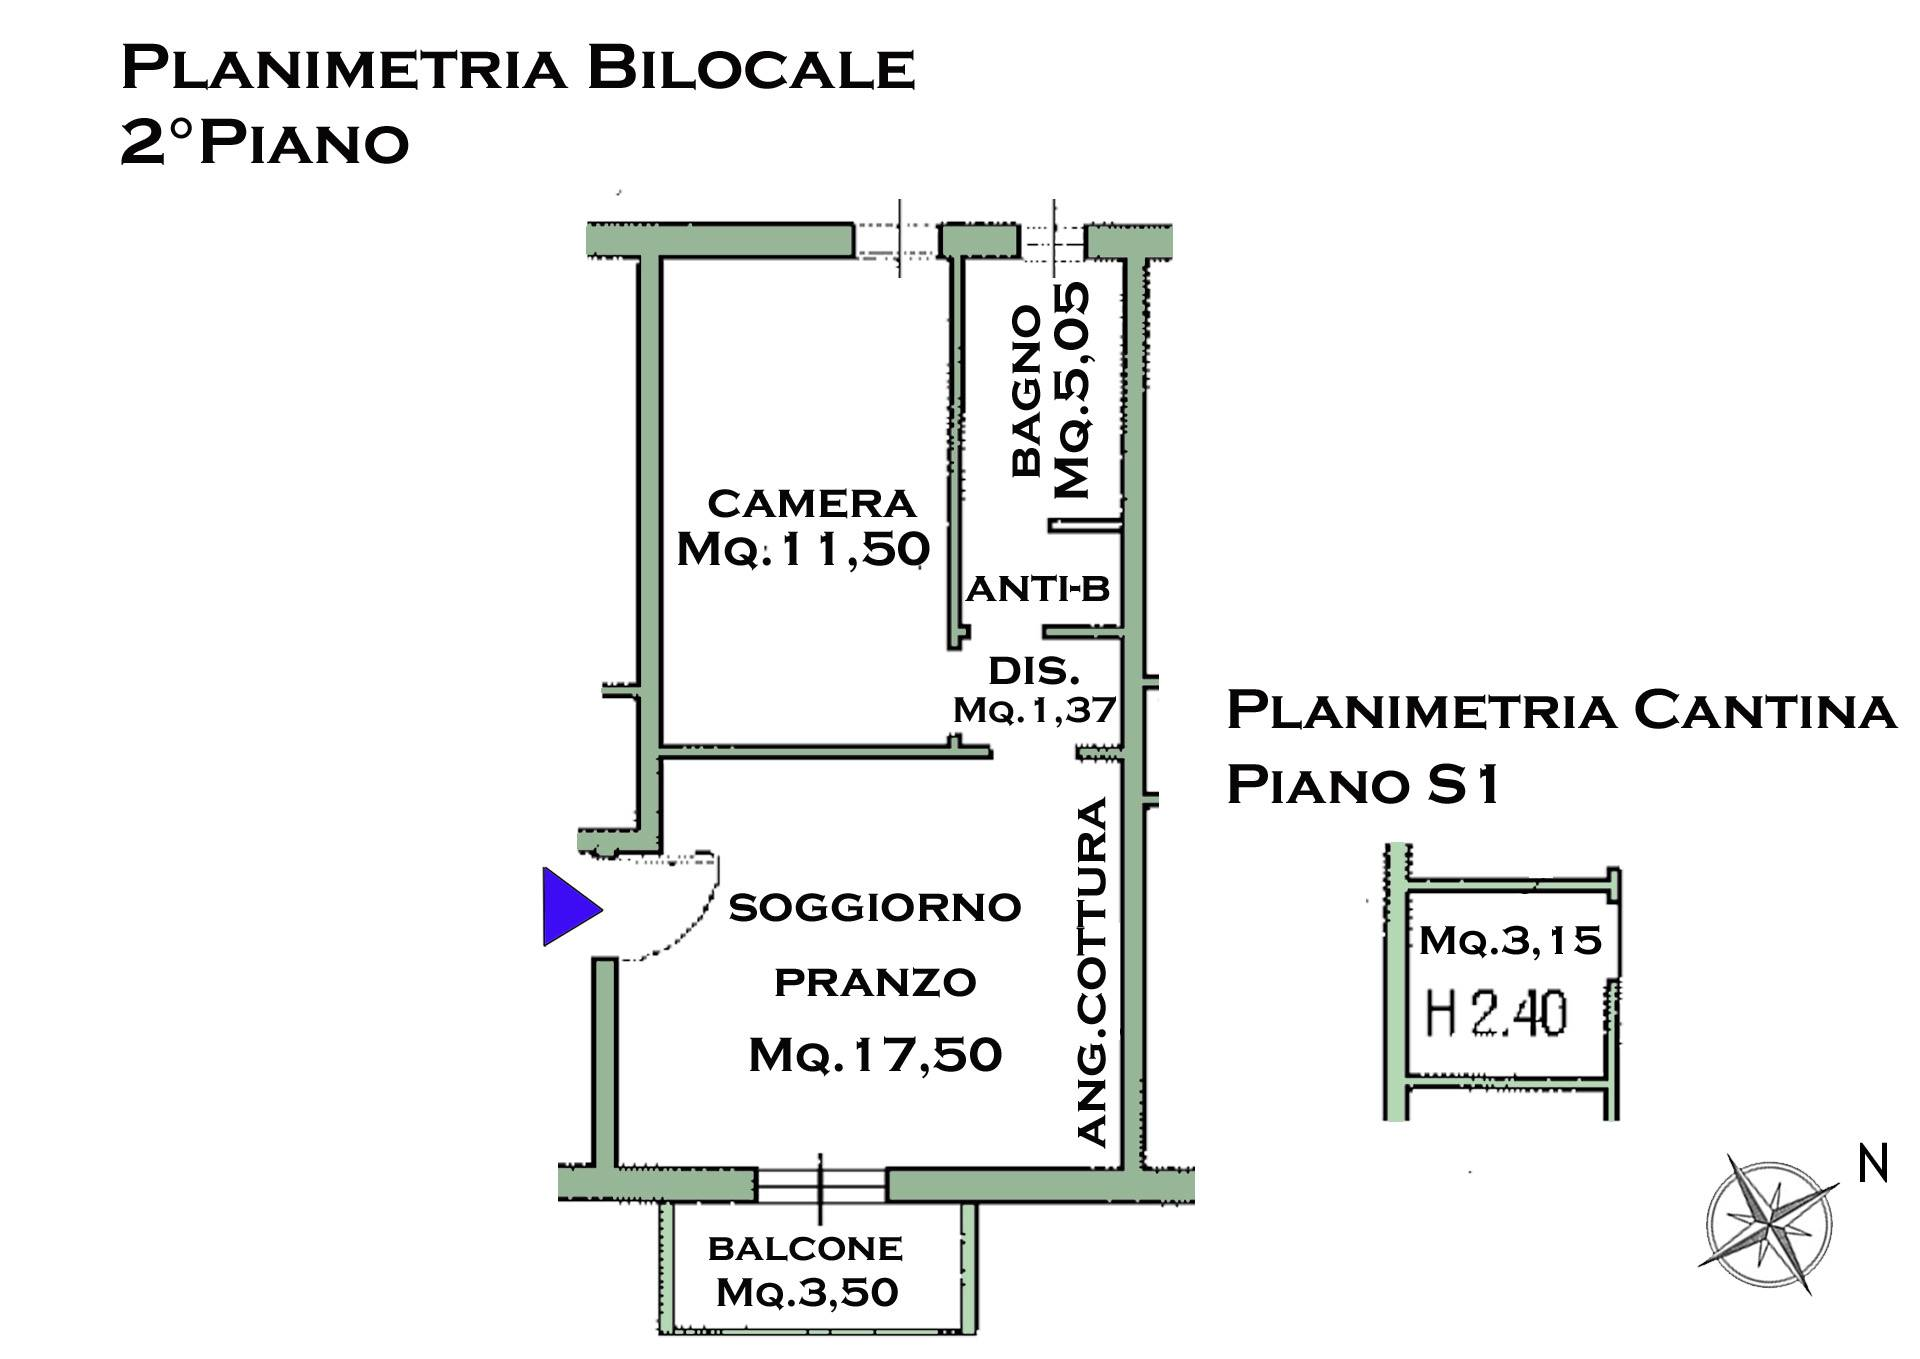 R44-planimetria bilocale